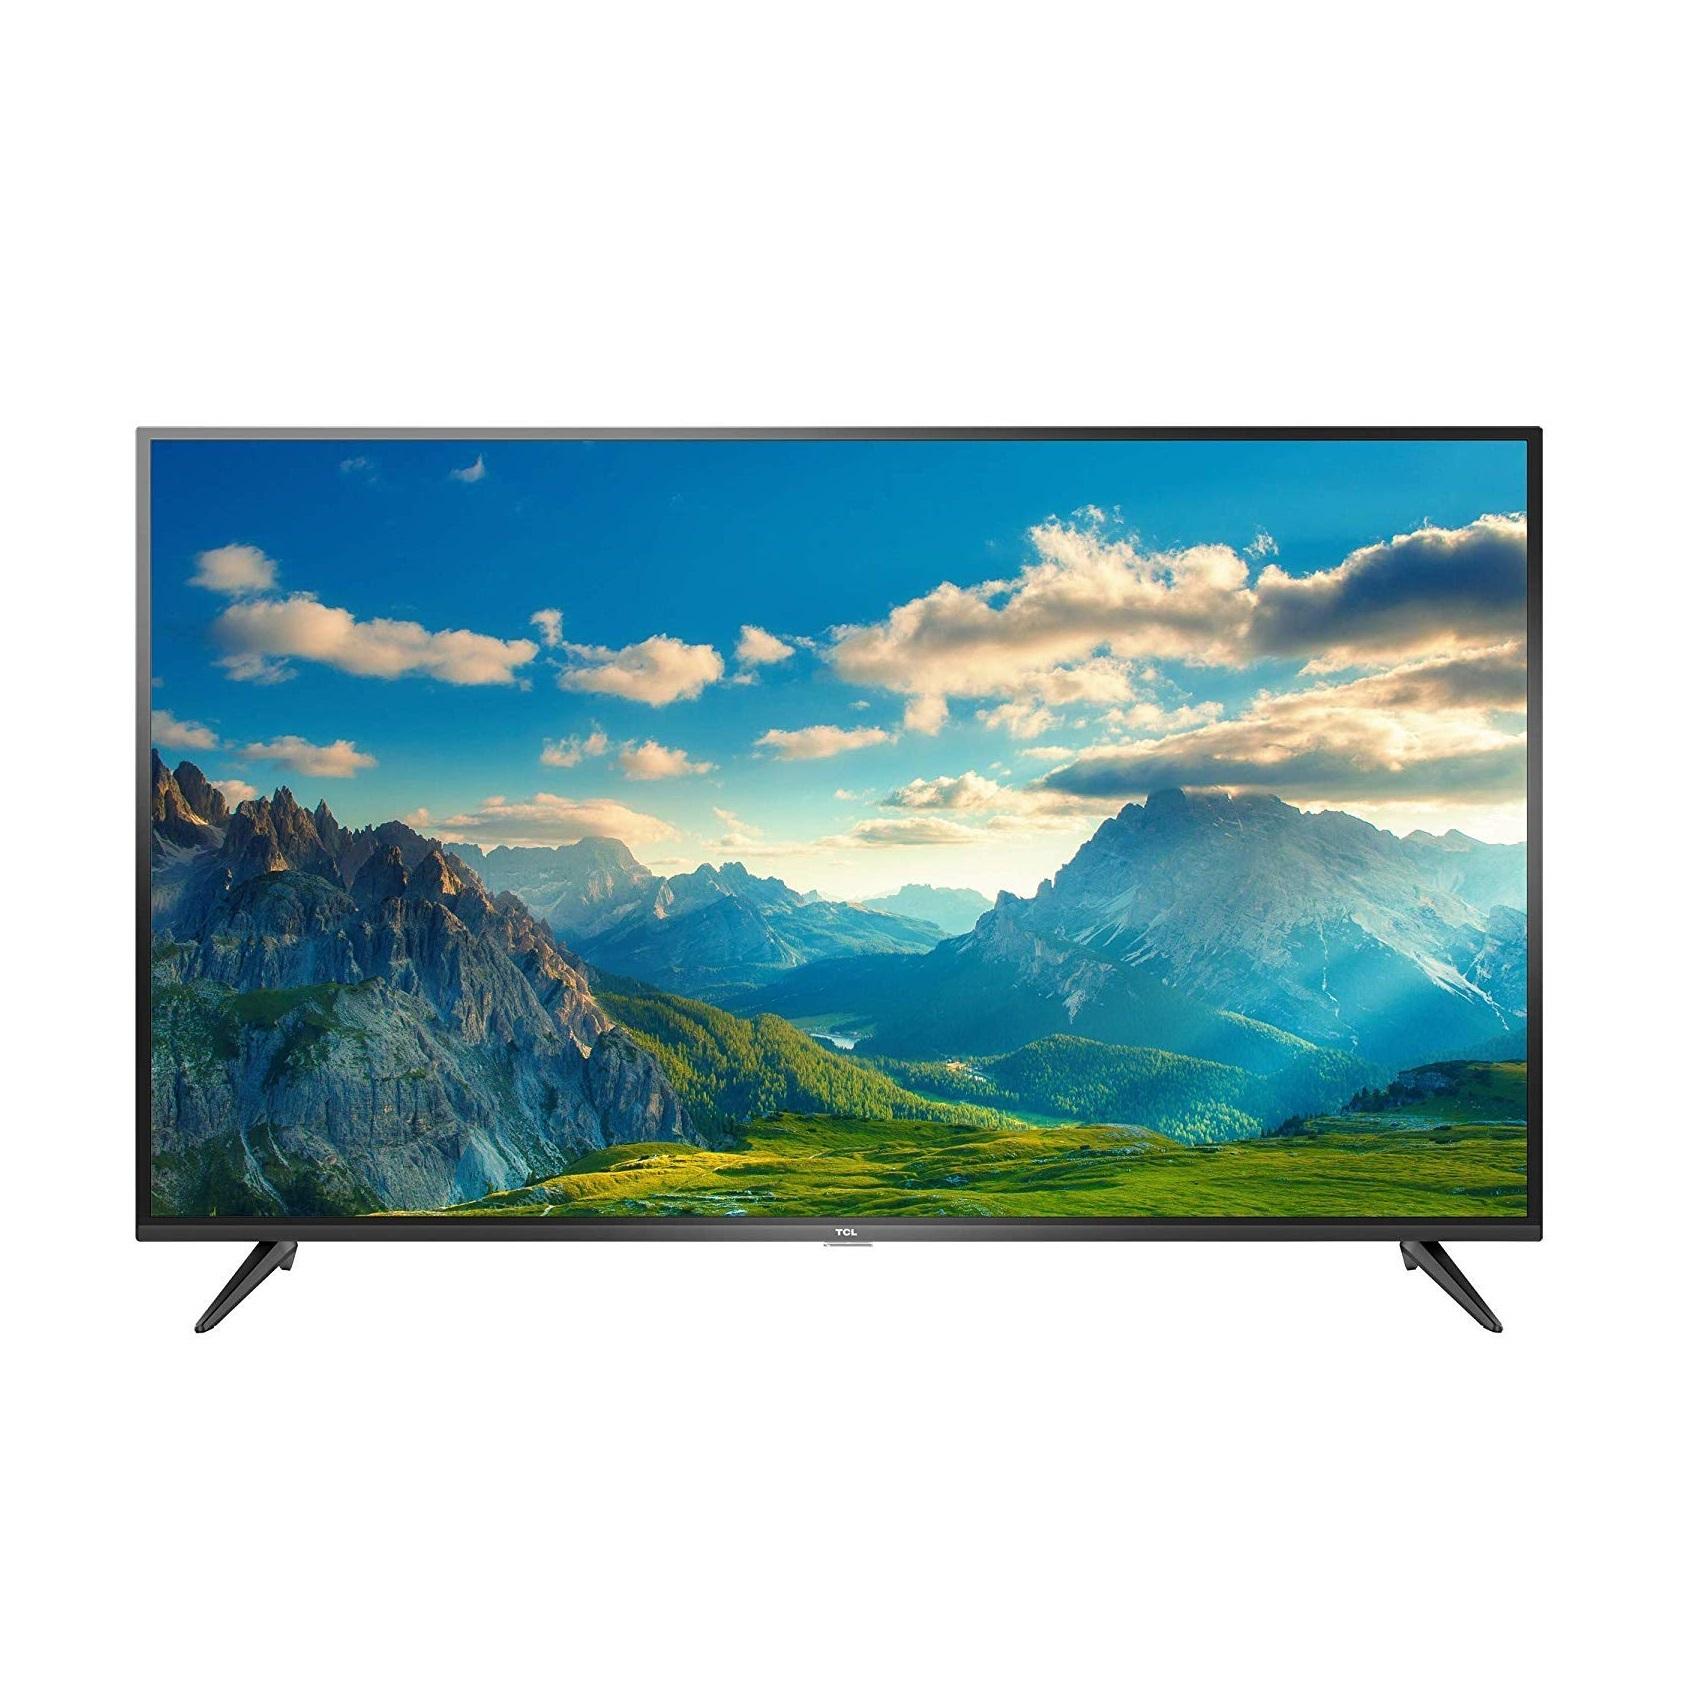 تصویر تلویزیون 55 اینچ تی سی ال مدل P65US TCL 55P65US TV